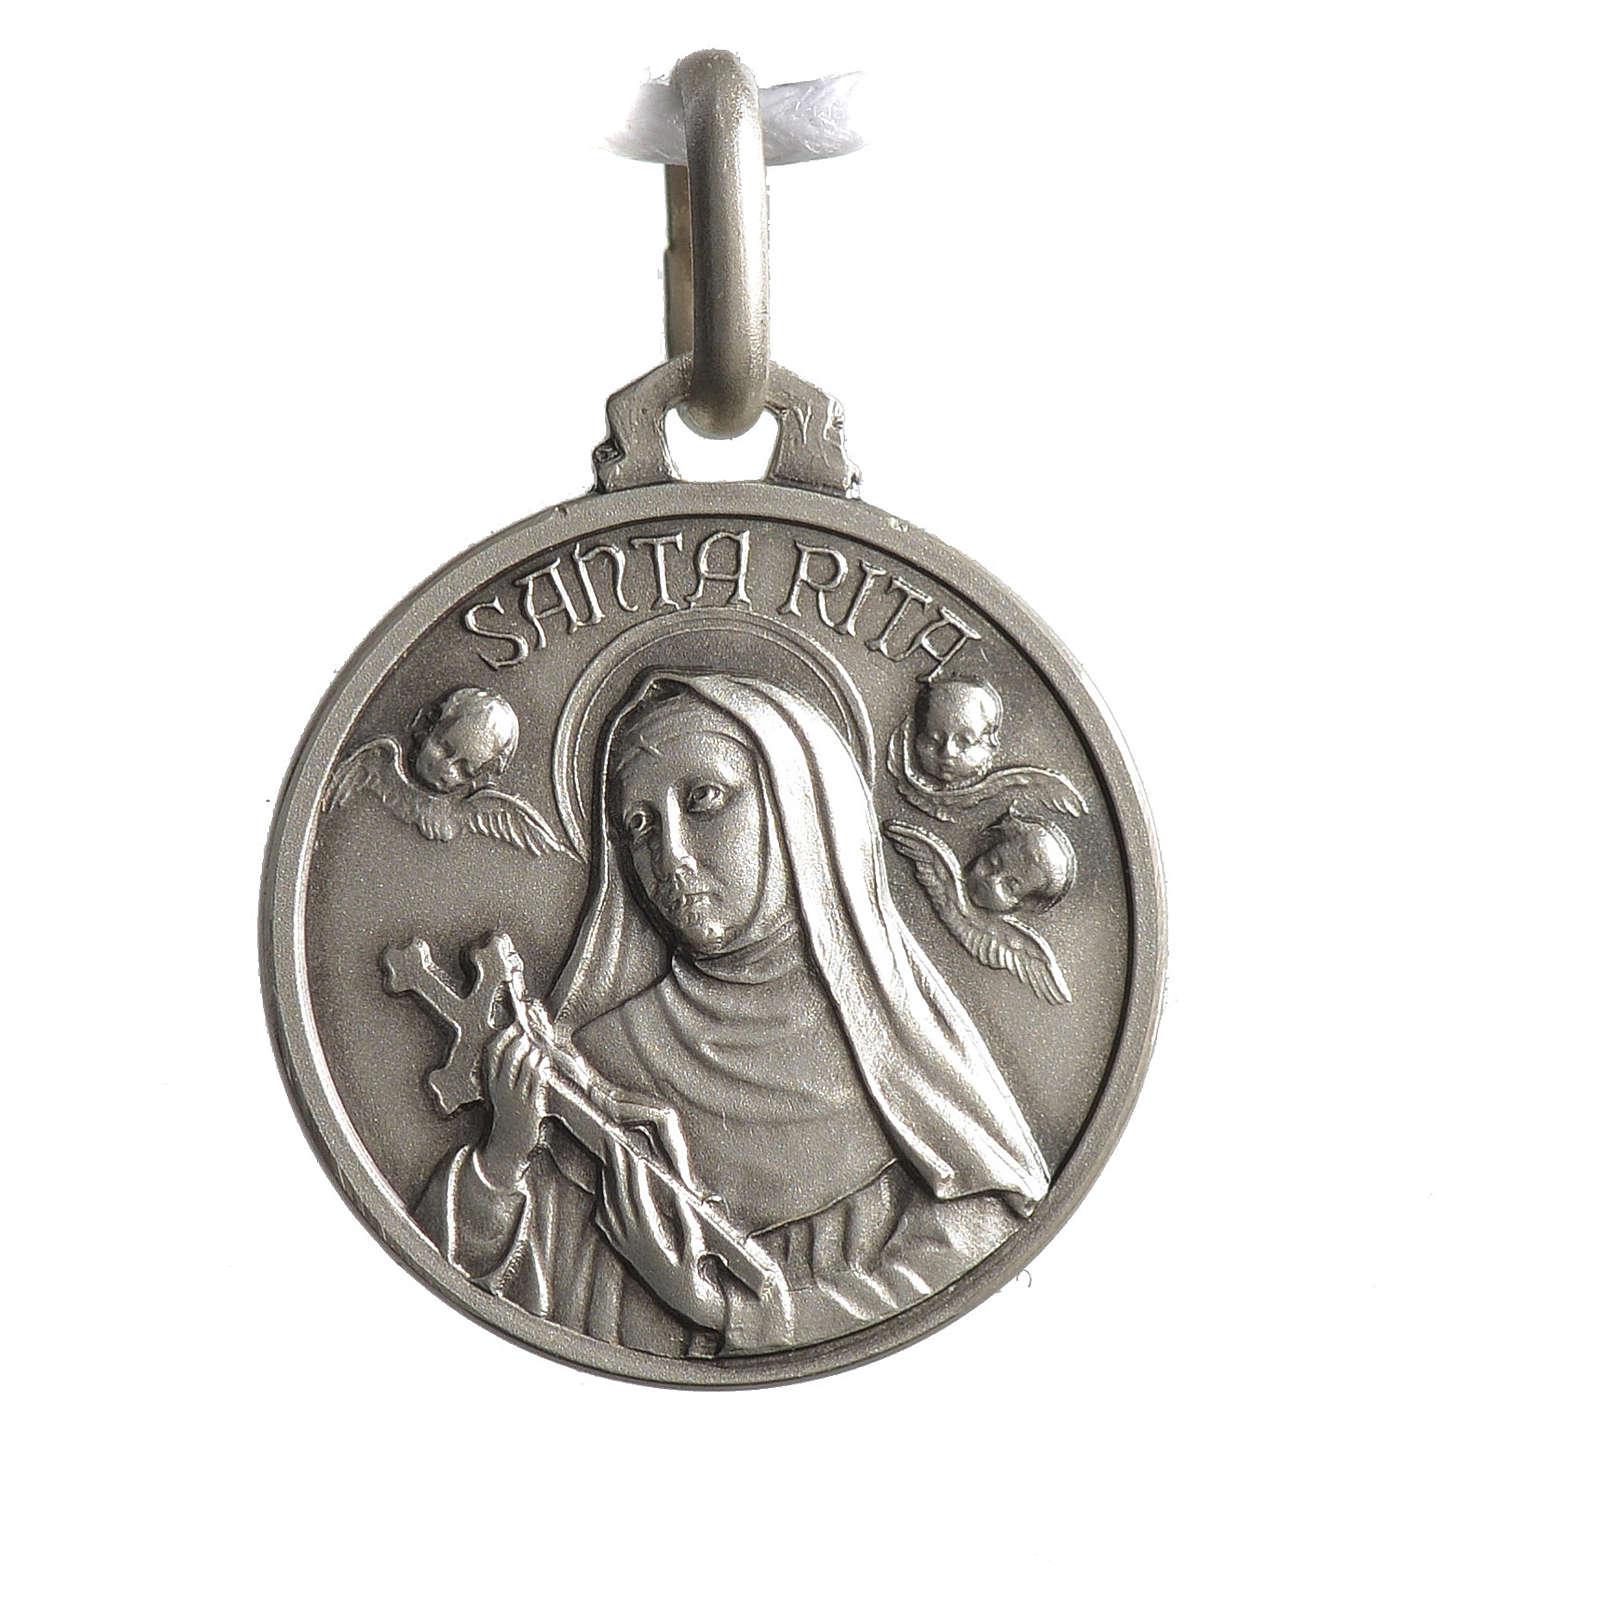 Medallita Santa Rita, Plata 925 4